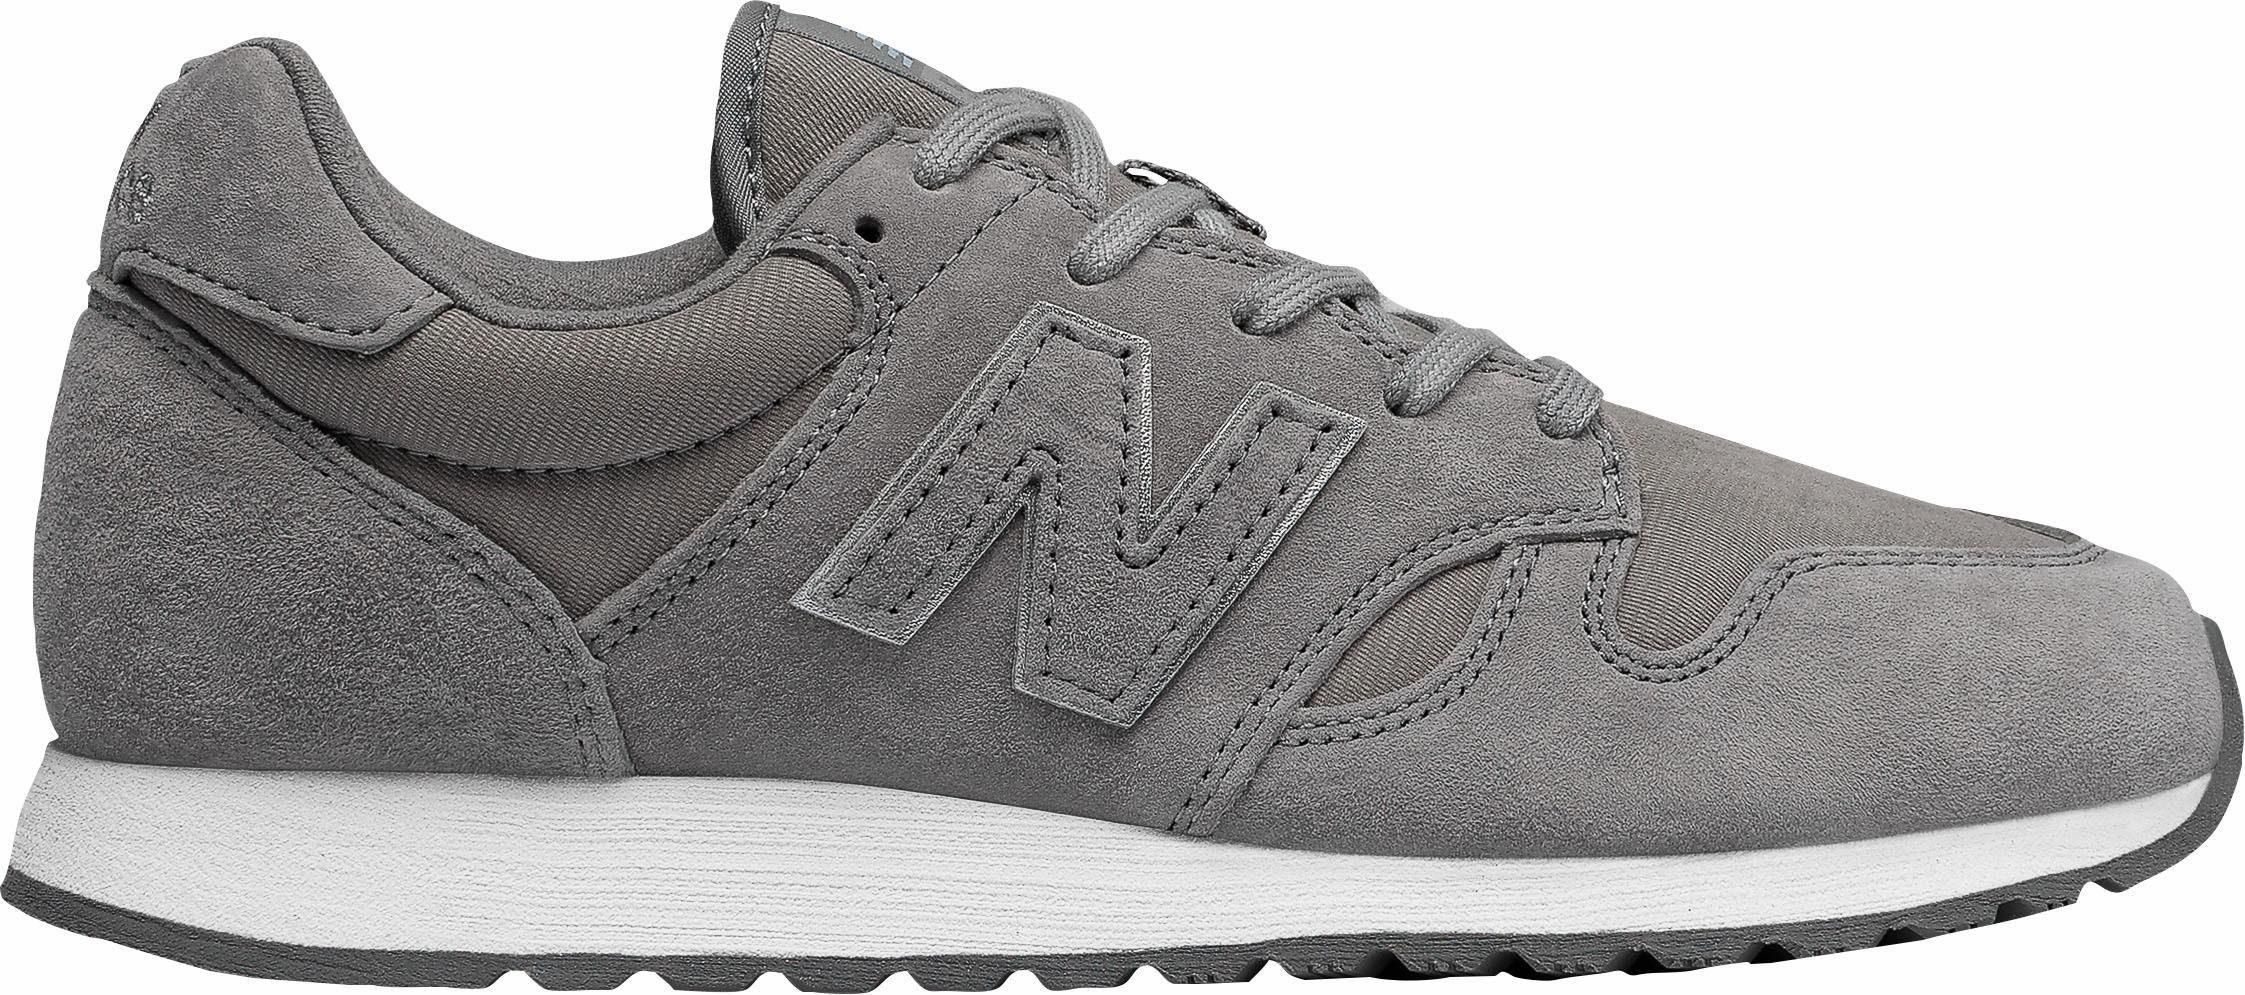 new balance schoenen maat 48